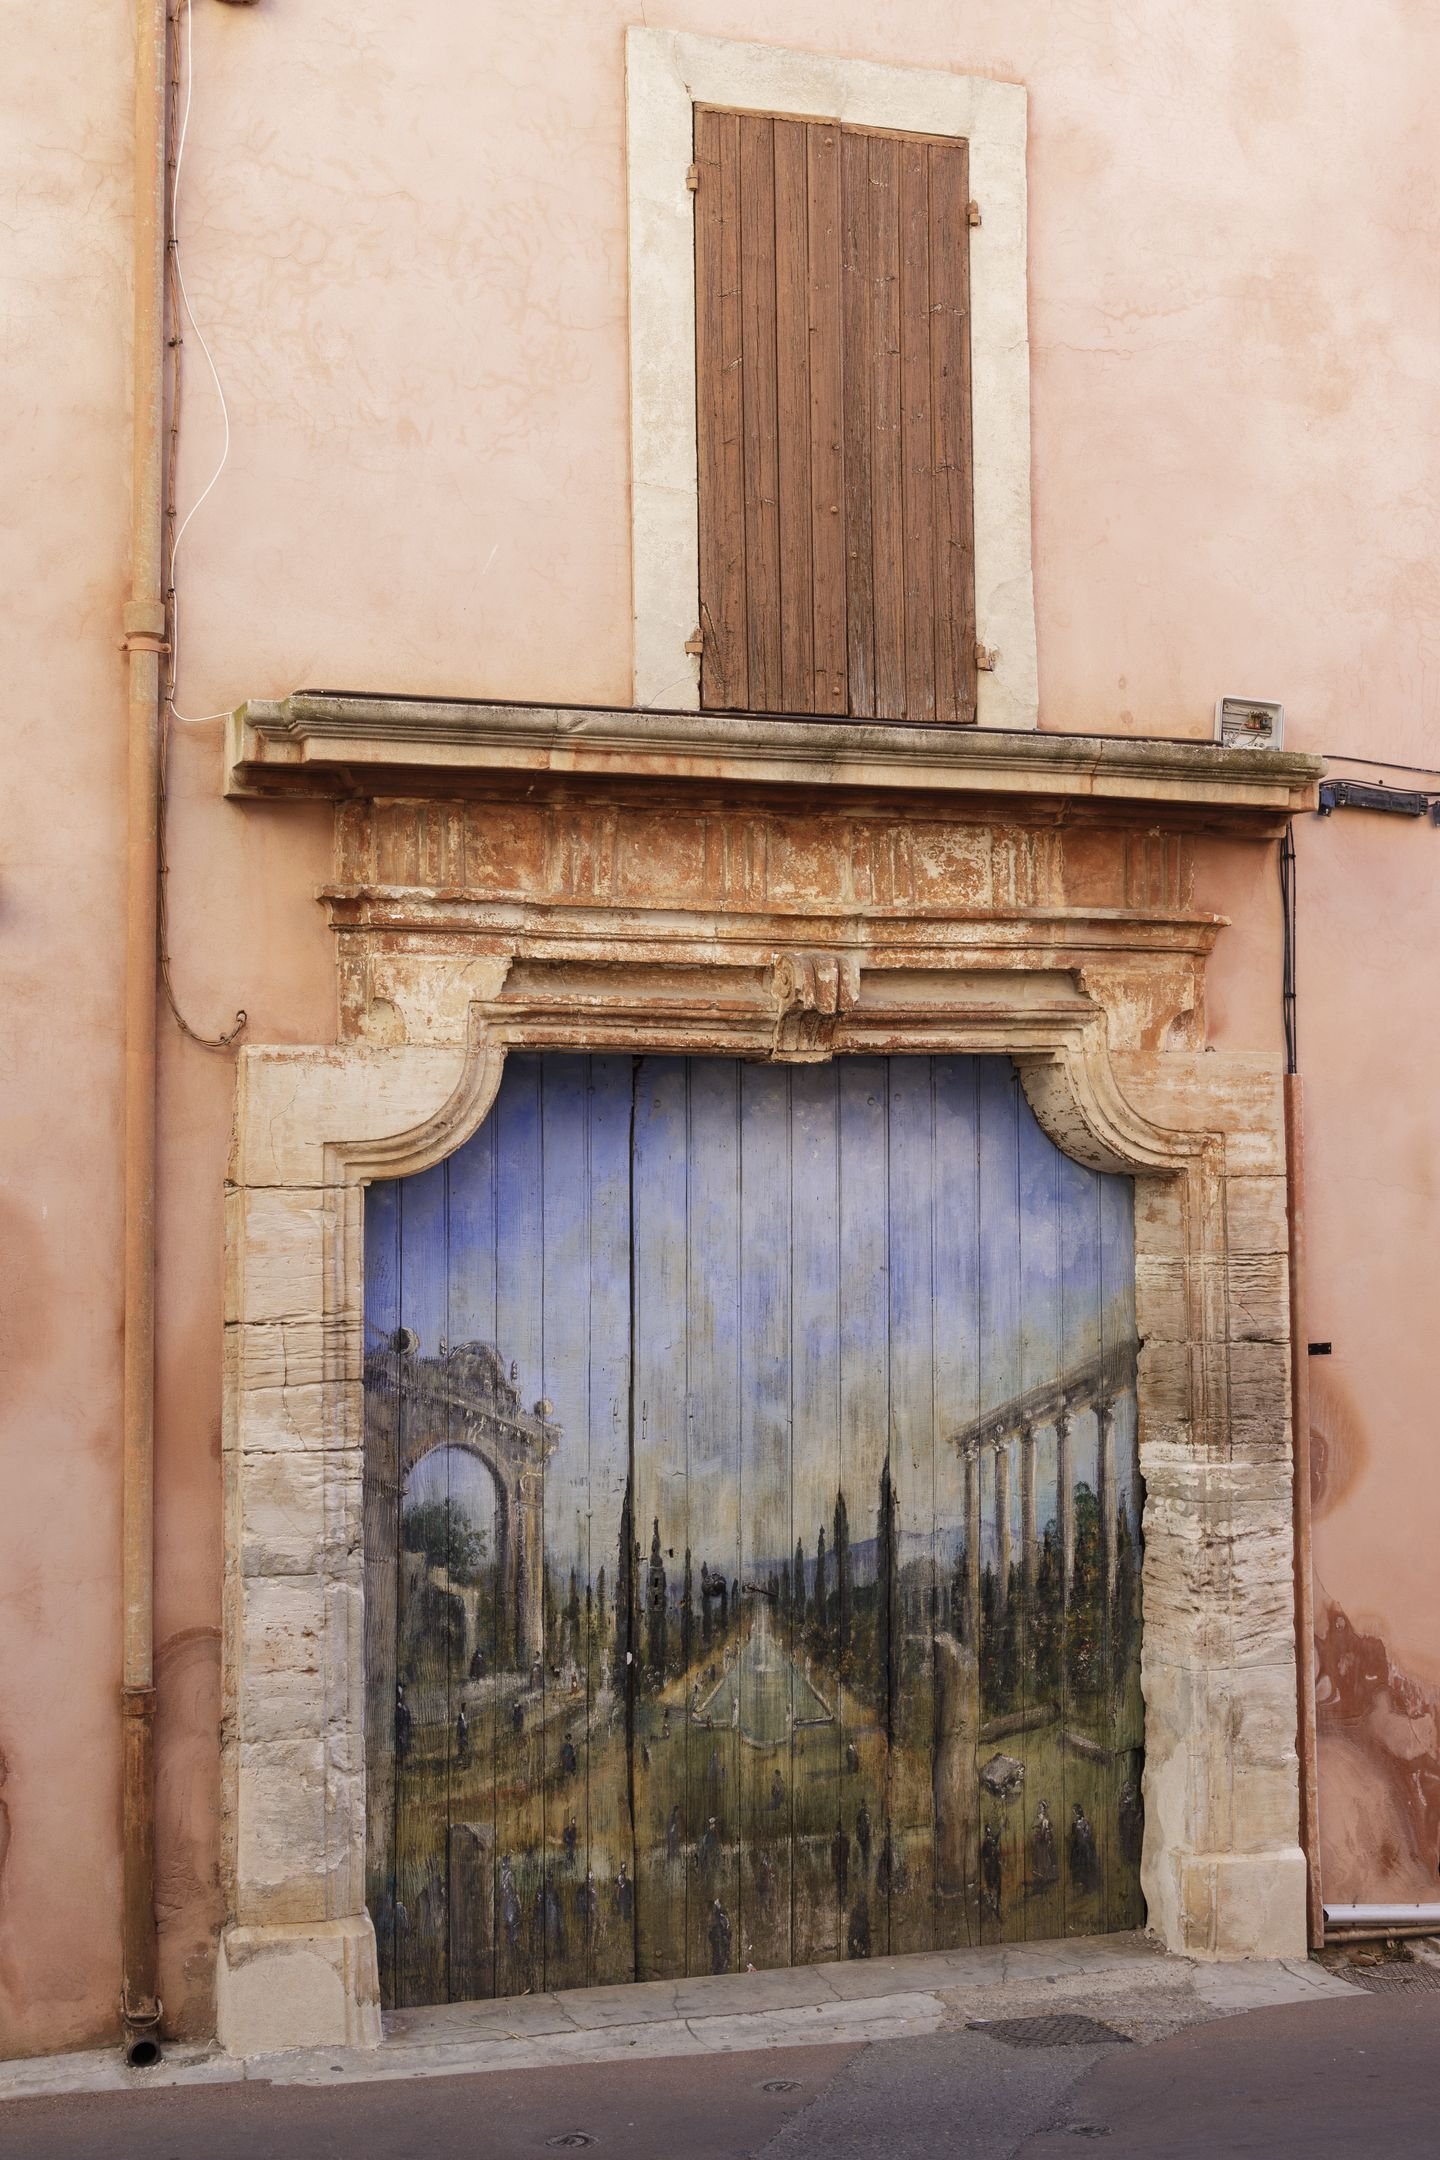 20210629-Provence-09-14-55-001